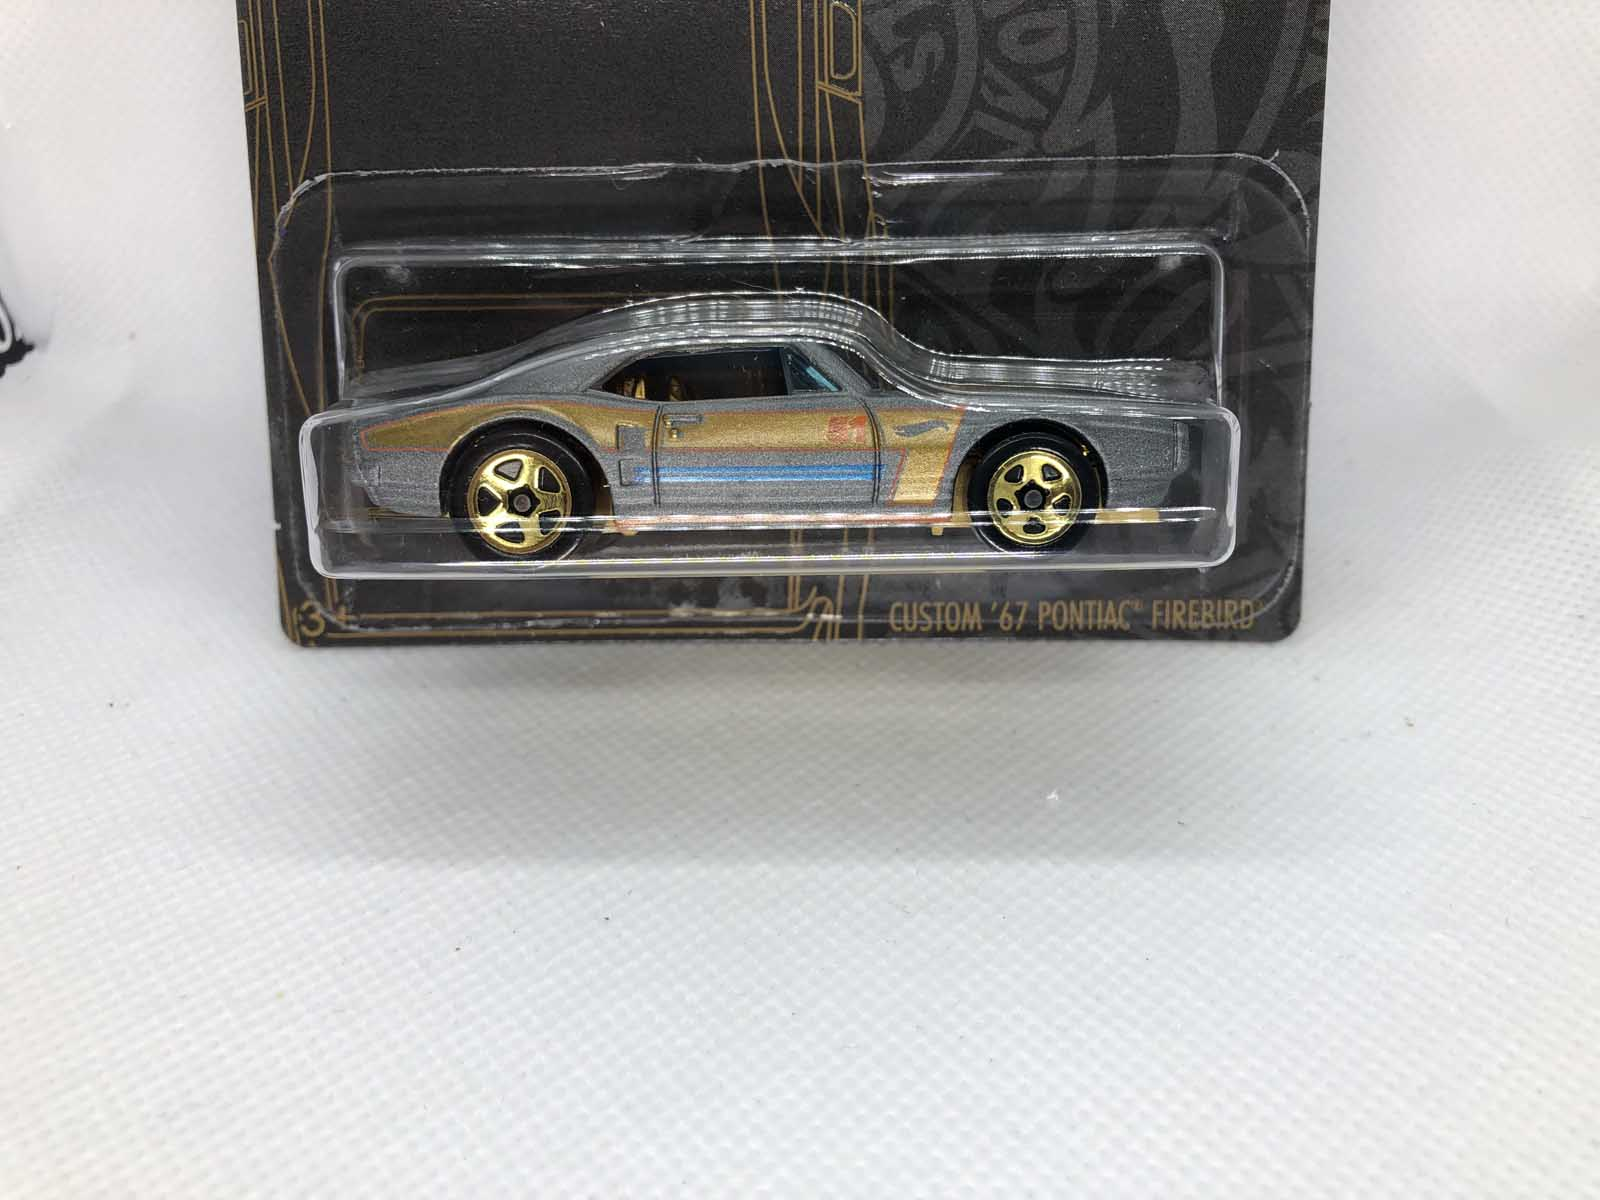 Custom 67 Pontiac Firebird